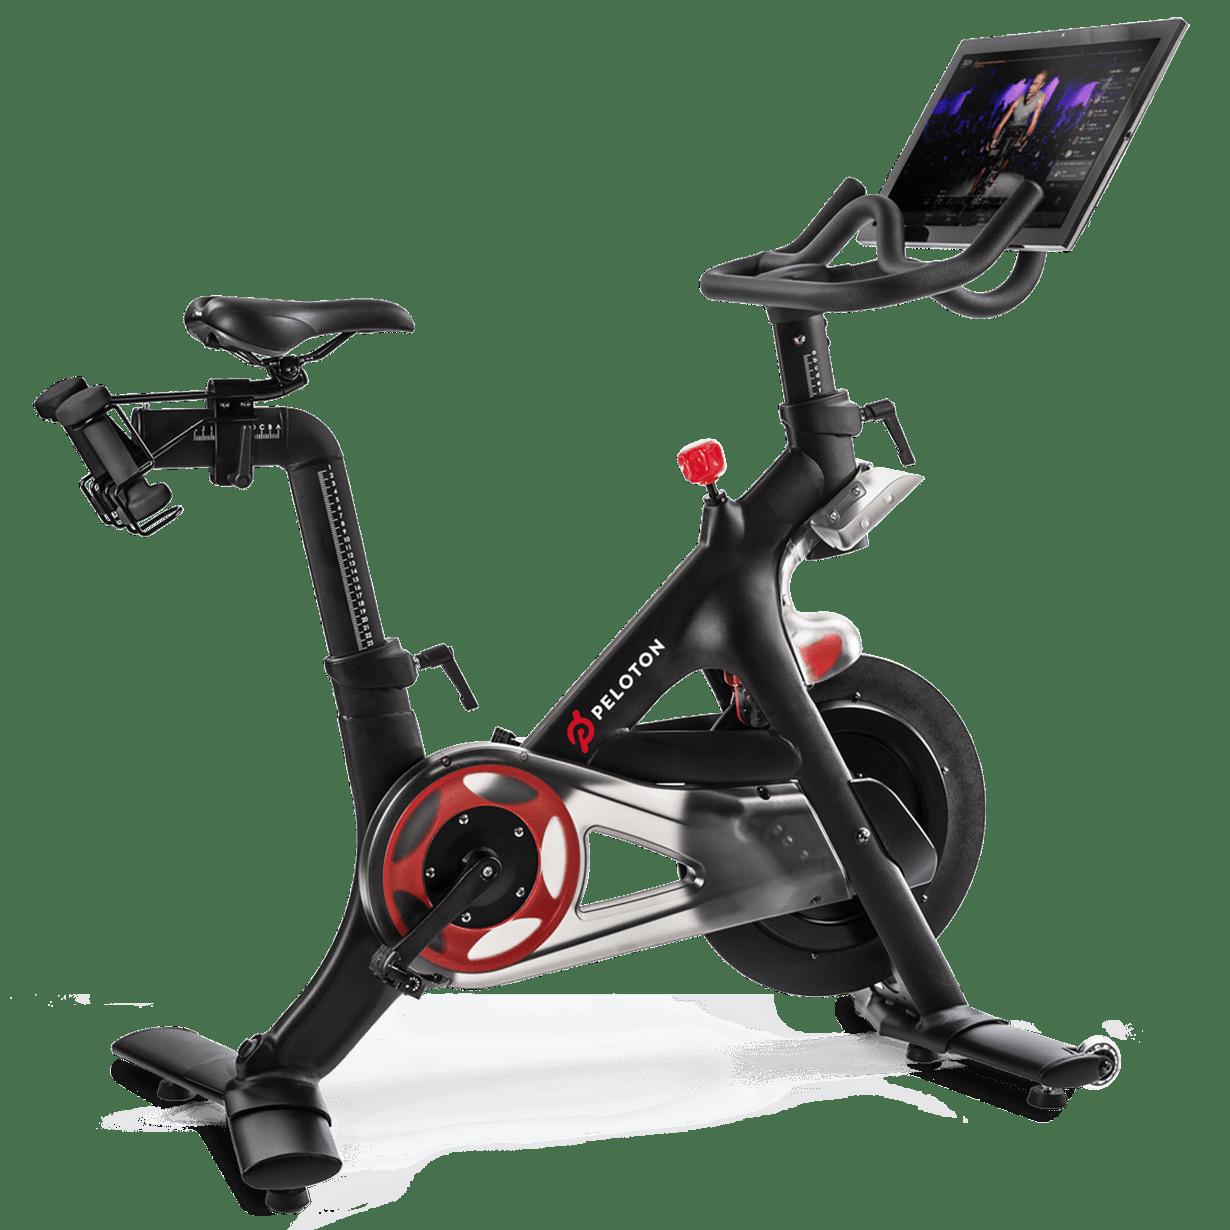 Peloton | Buy the Peloton Bike